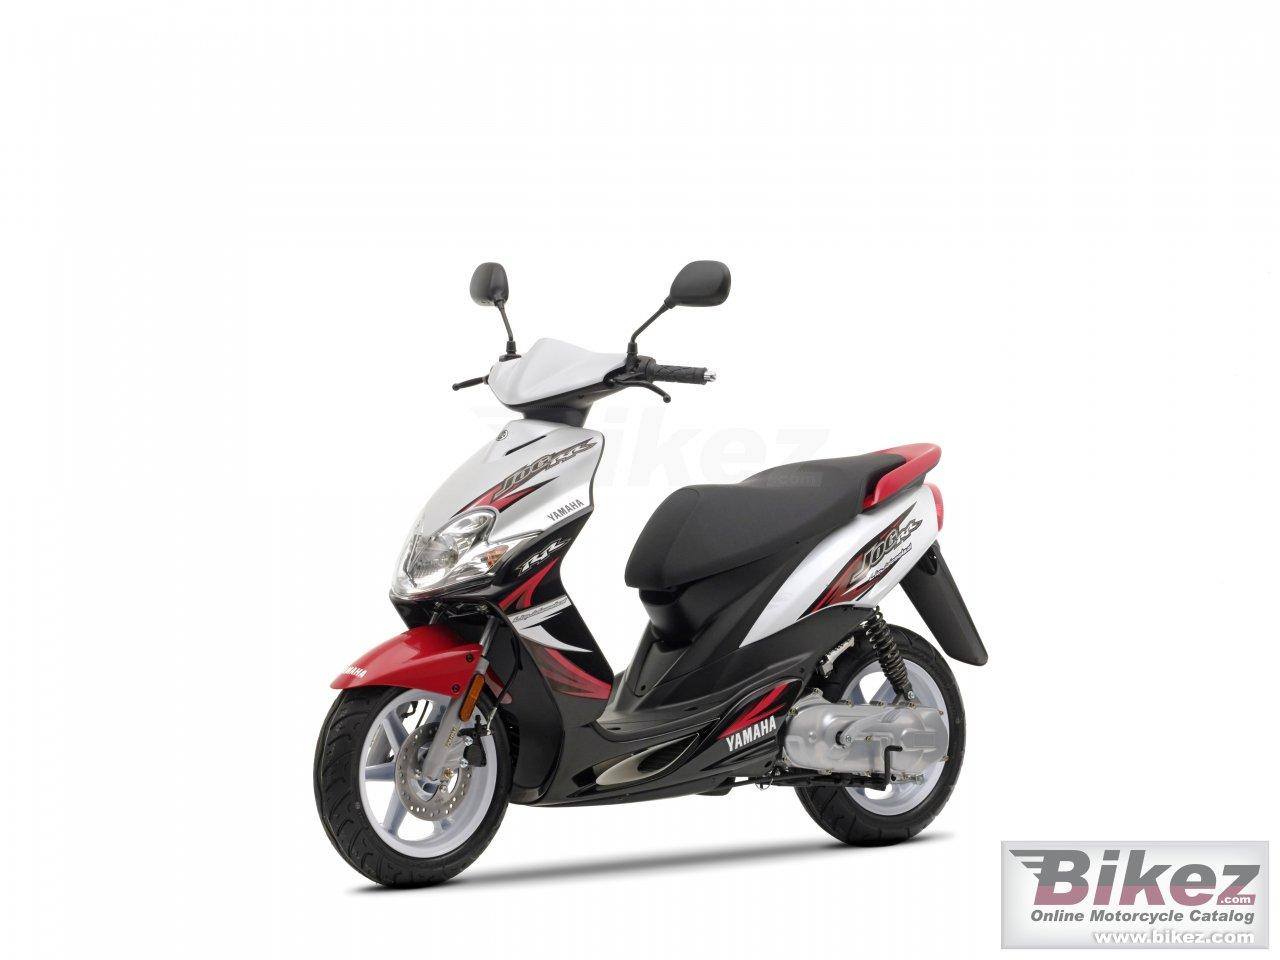 Yamaha jog rr 2009 #7 - size 1600